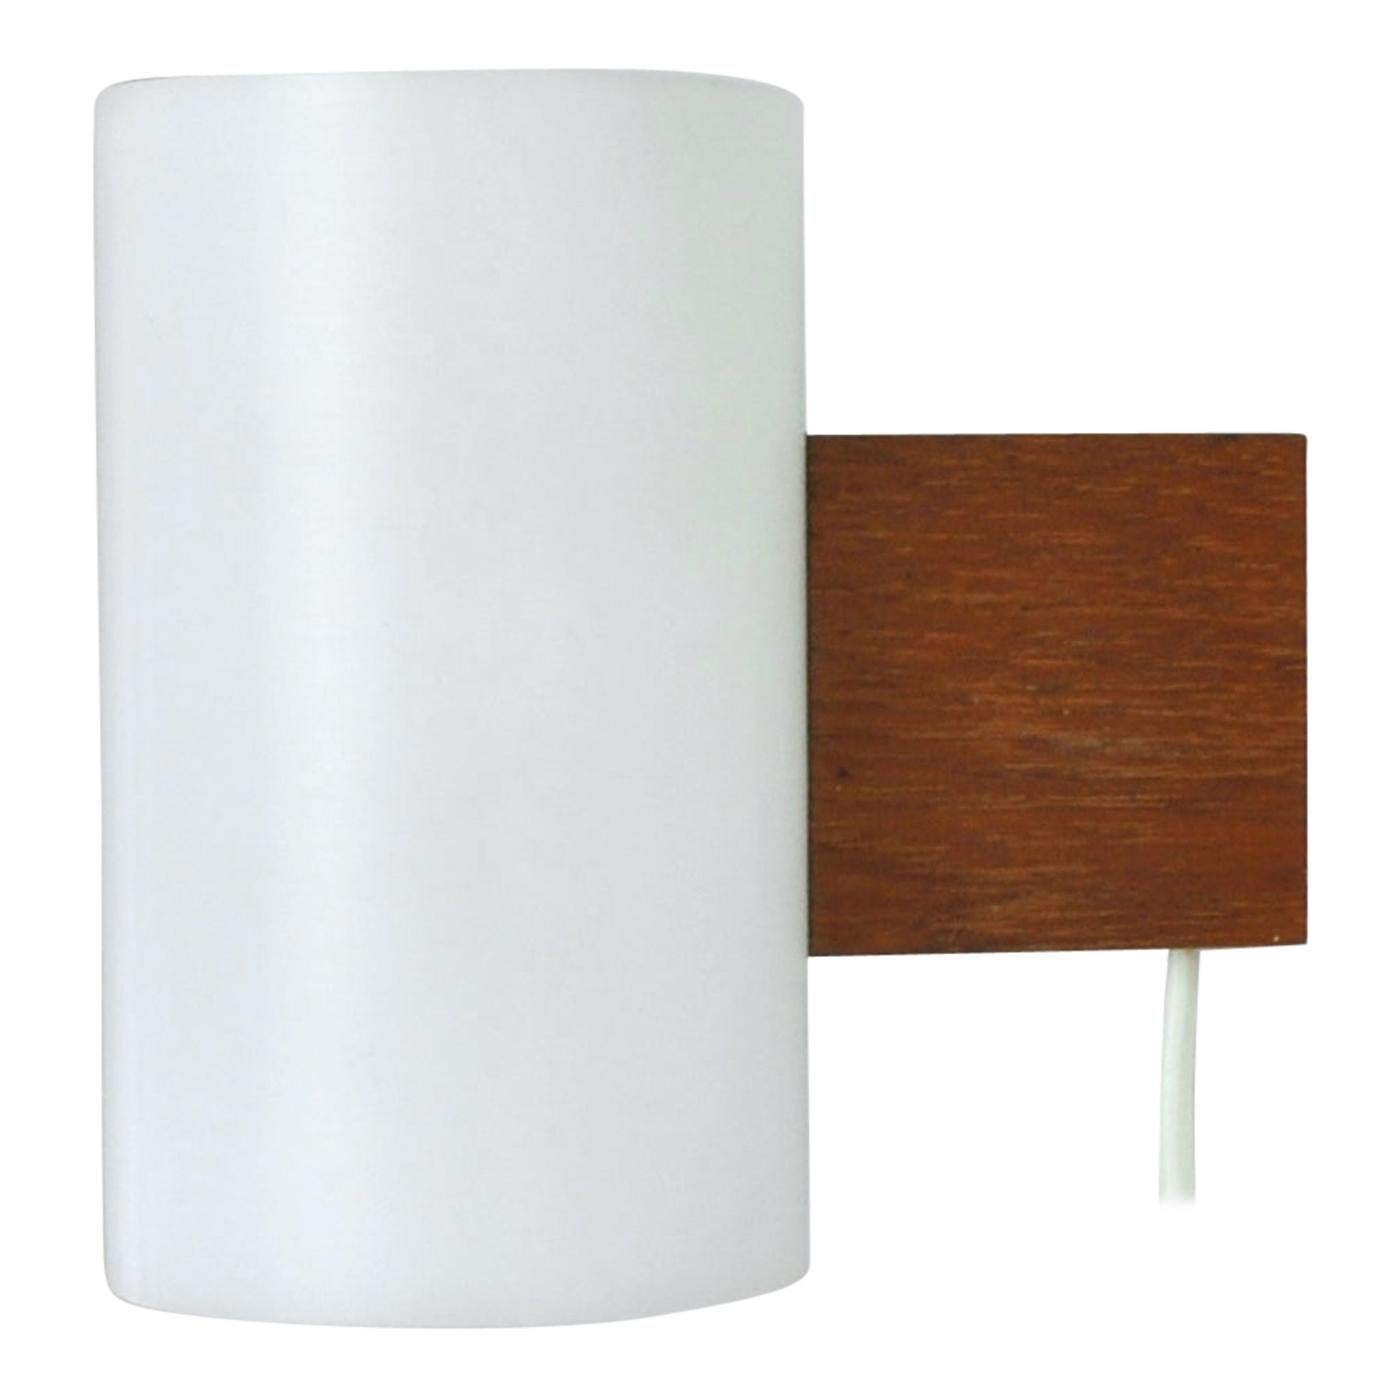 Minimalistic Swedish Wall Lamp Designed by Uno & Östen Kristiansson, 1960s